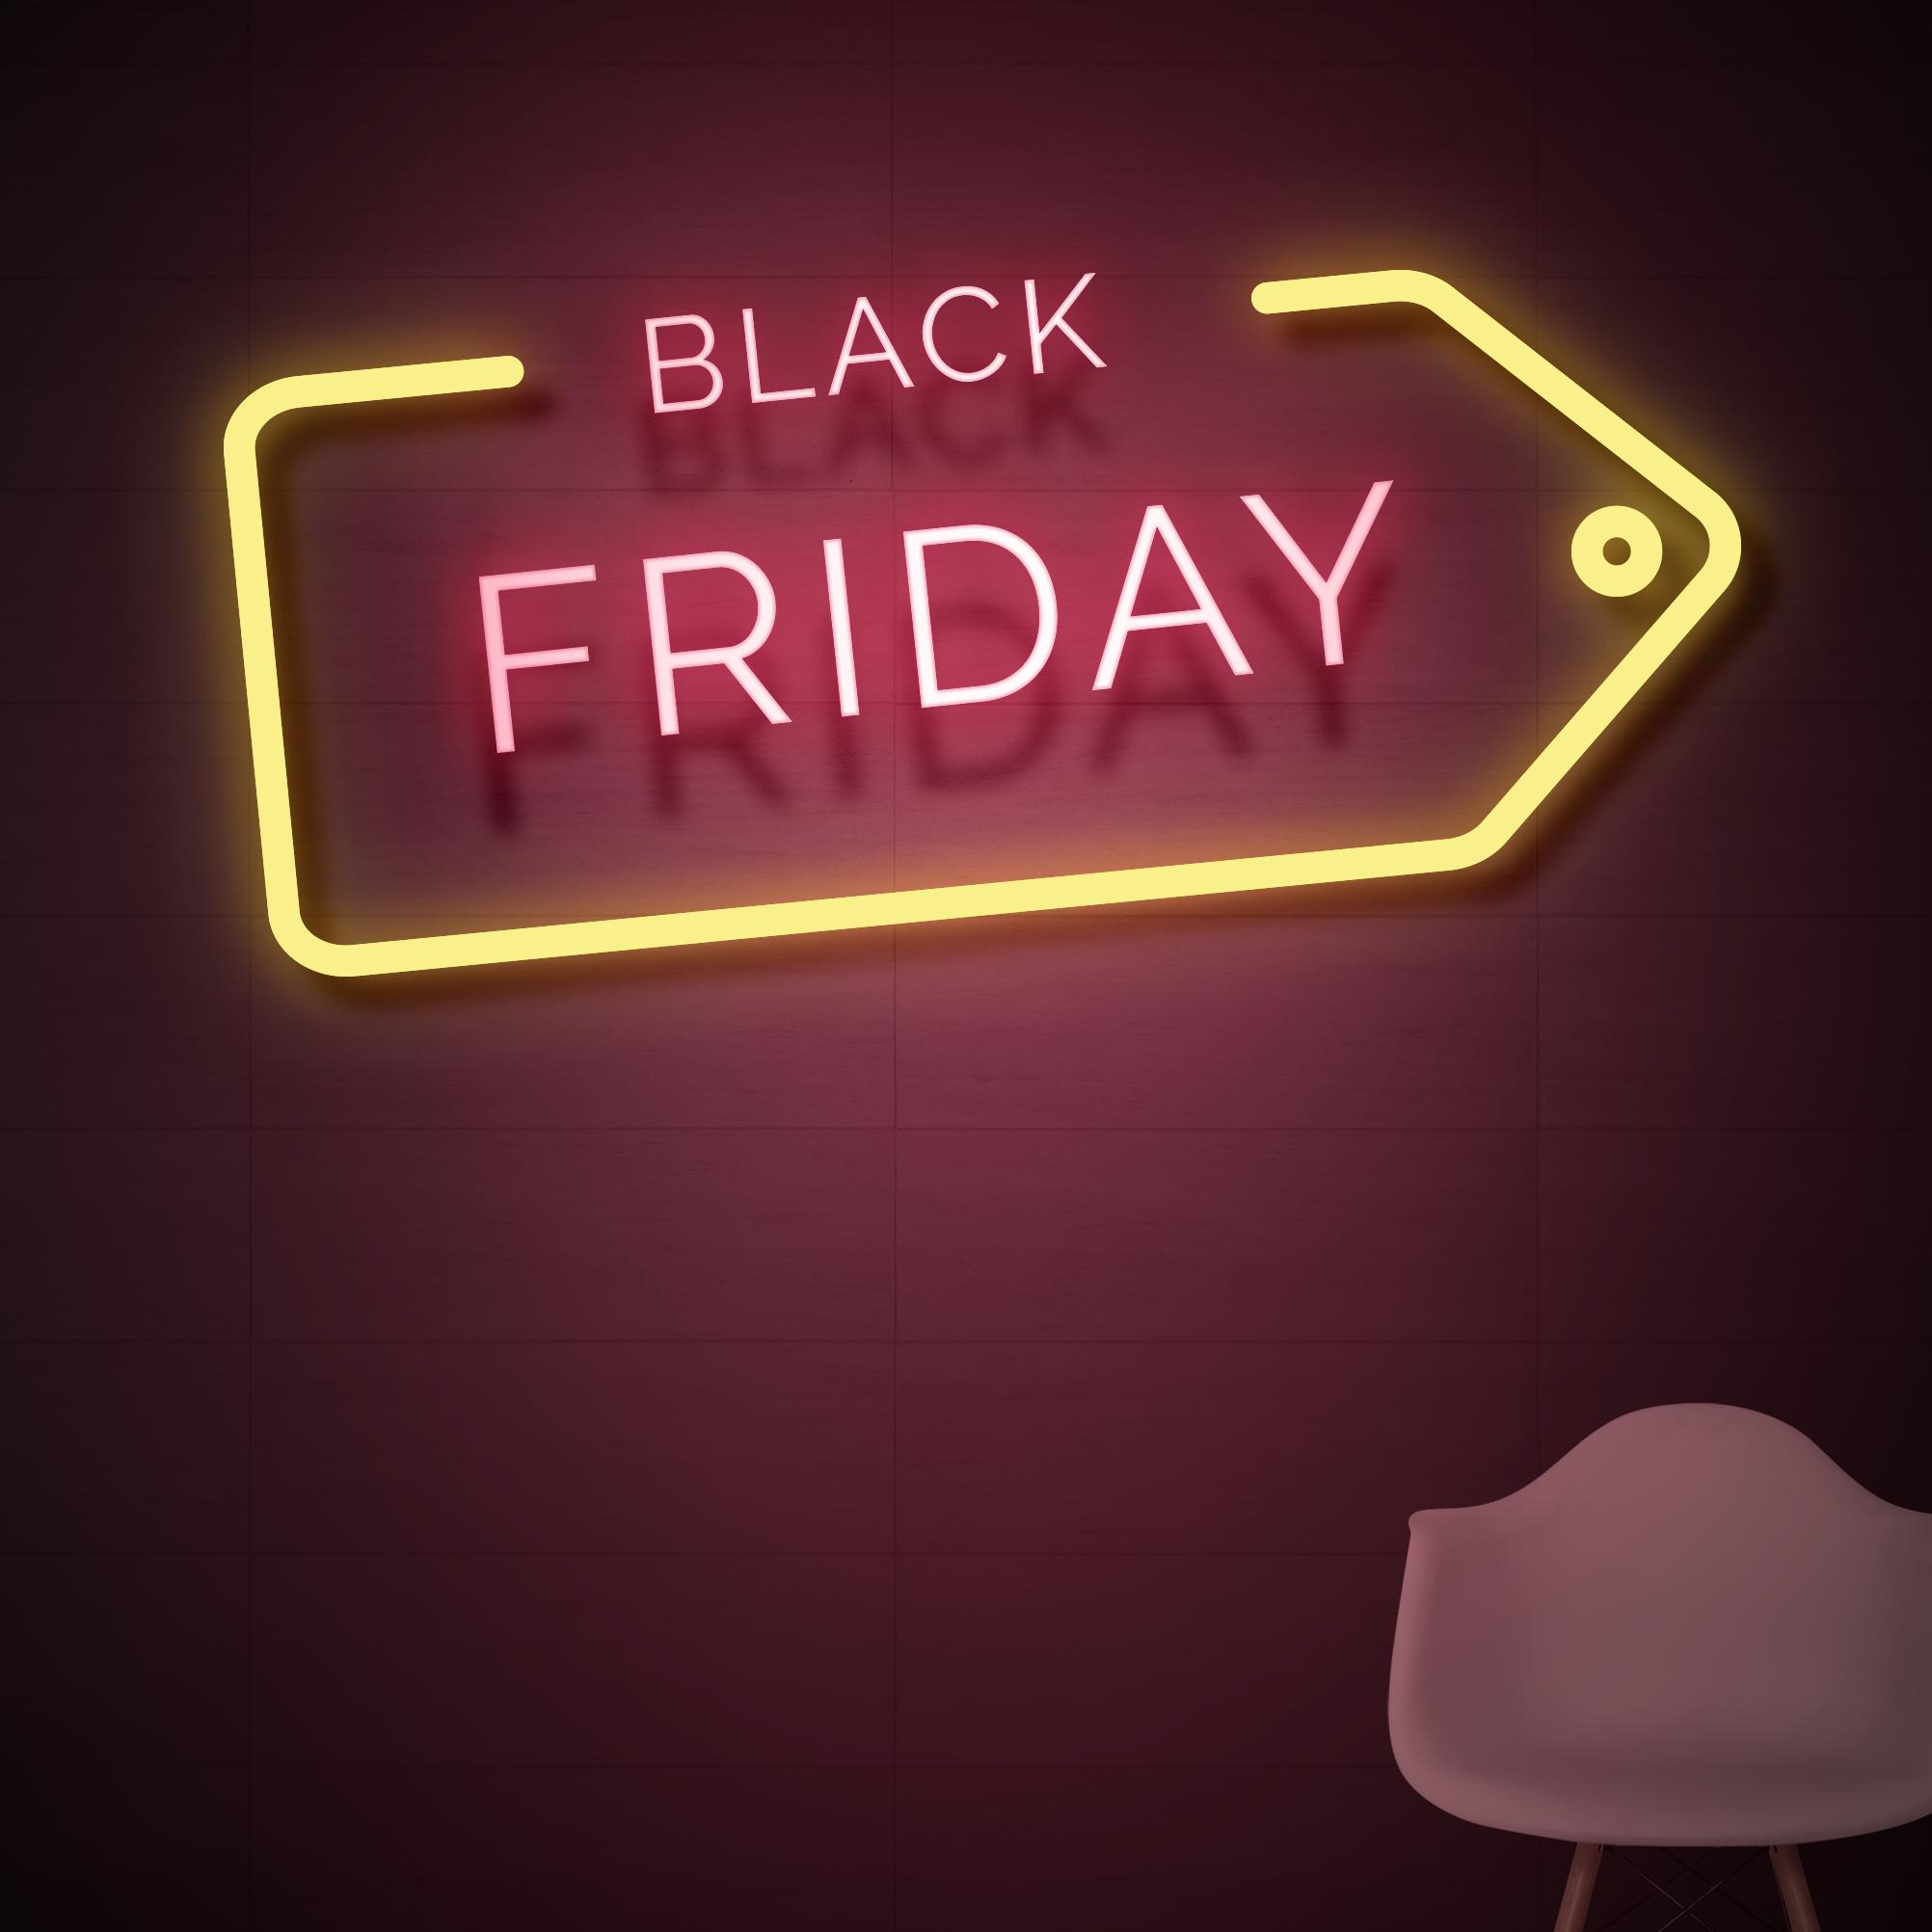 Black Friday 26